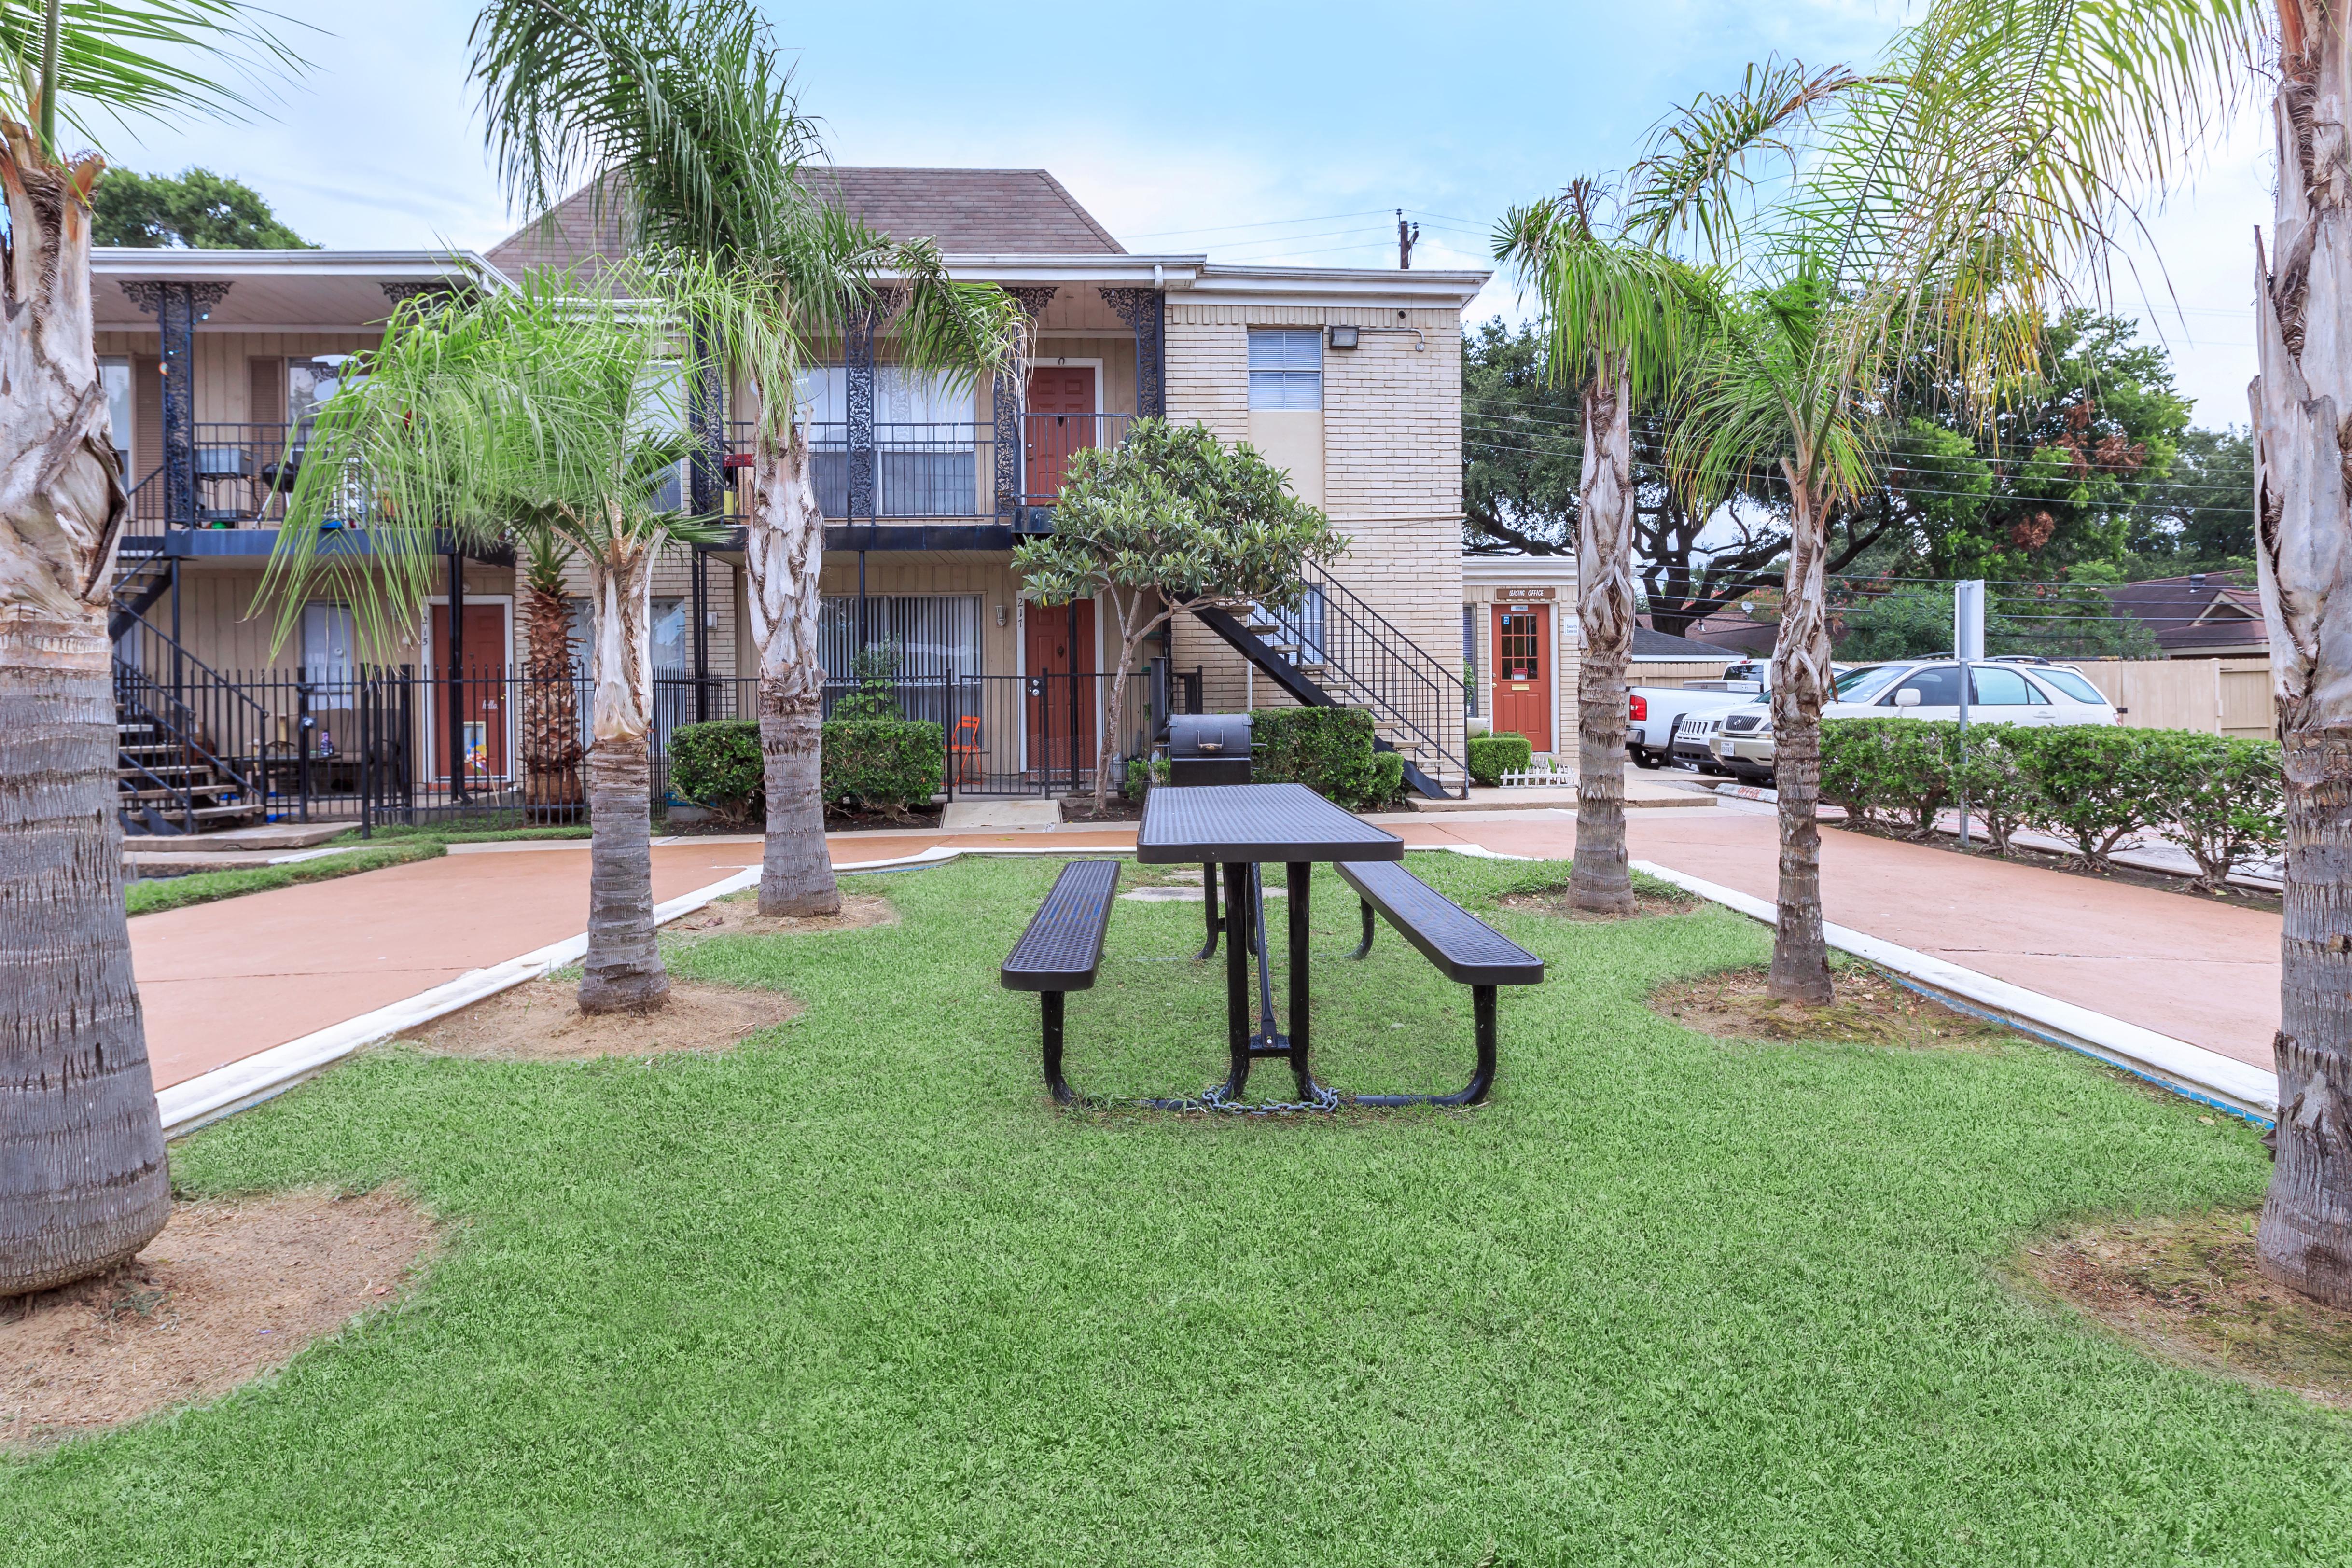 braeswood plaza amenities